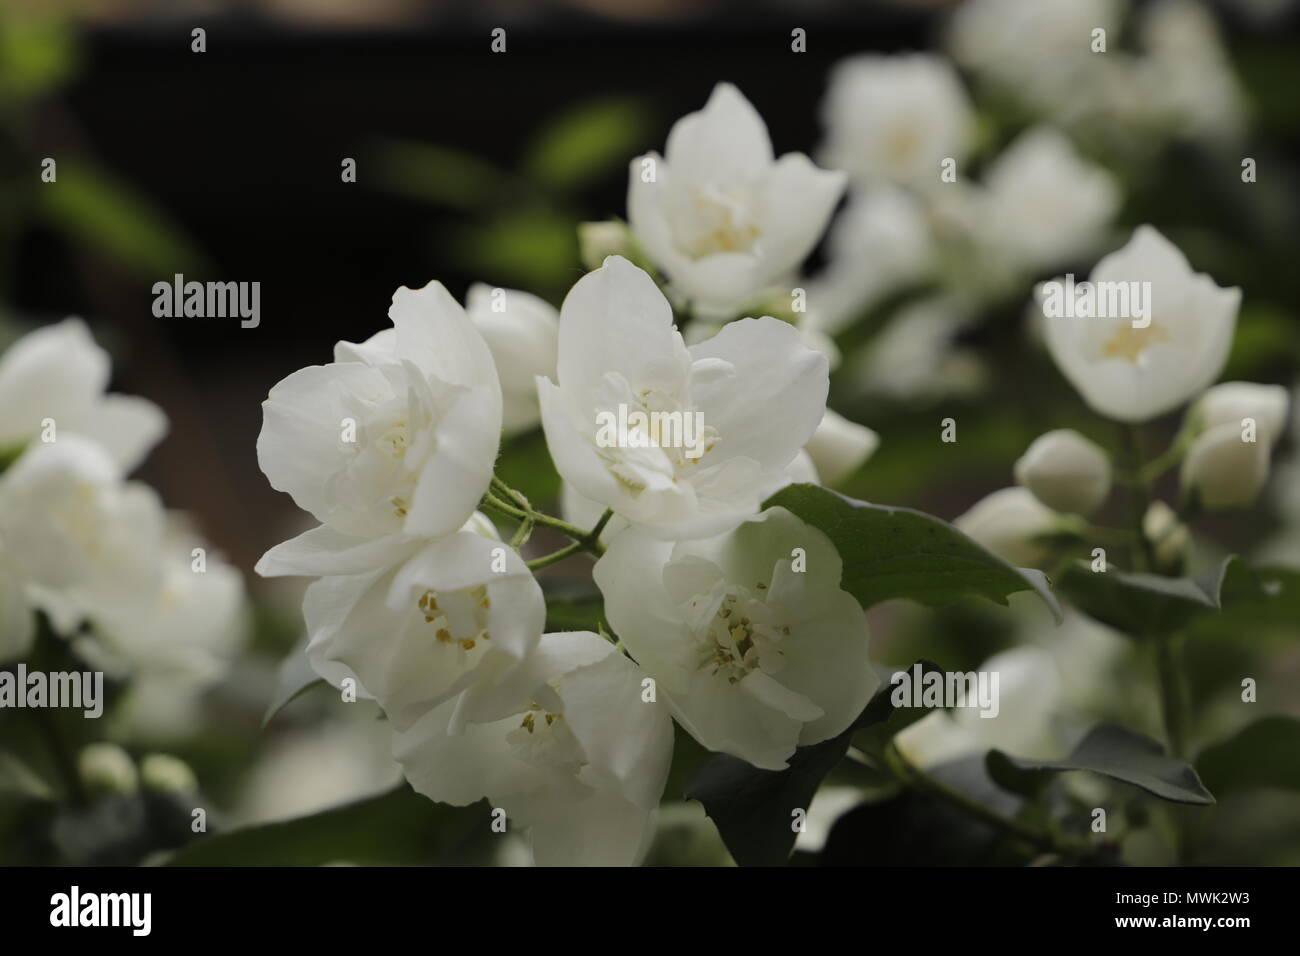 Jasmine flowers in the spring - Stock Image